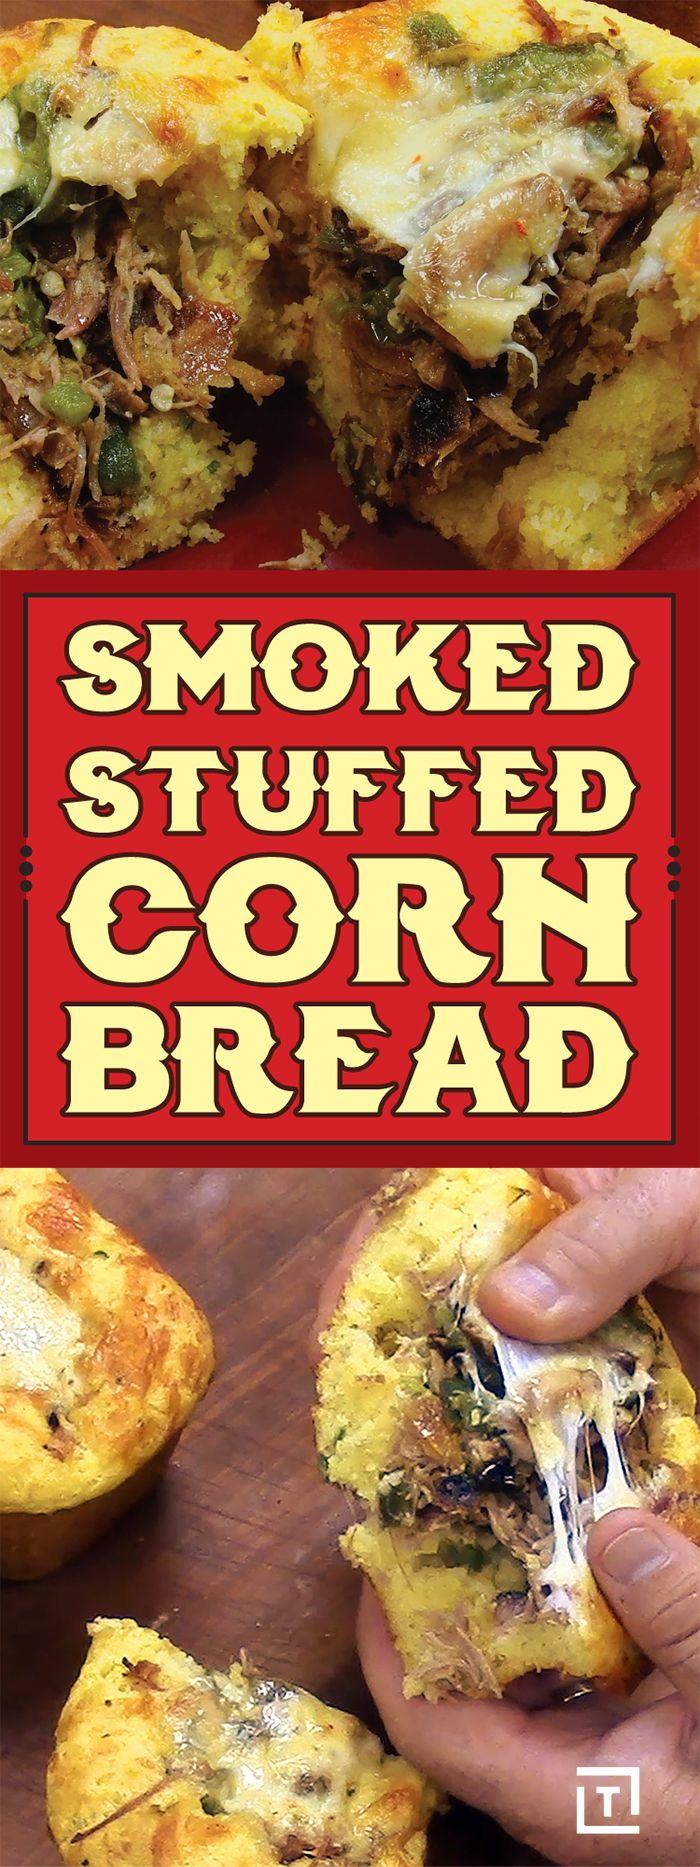 Best 25 Smoker Recipes Ideas On Pinterest Smokers